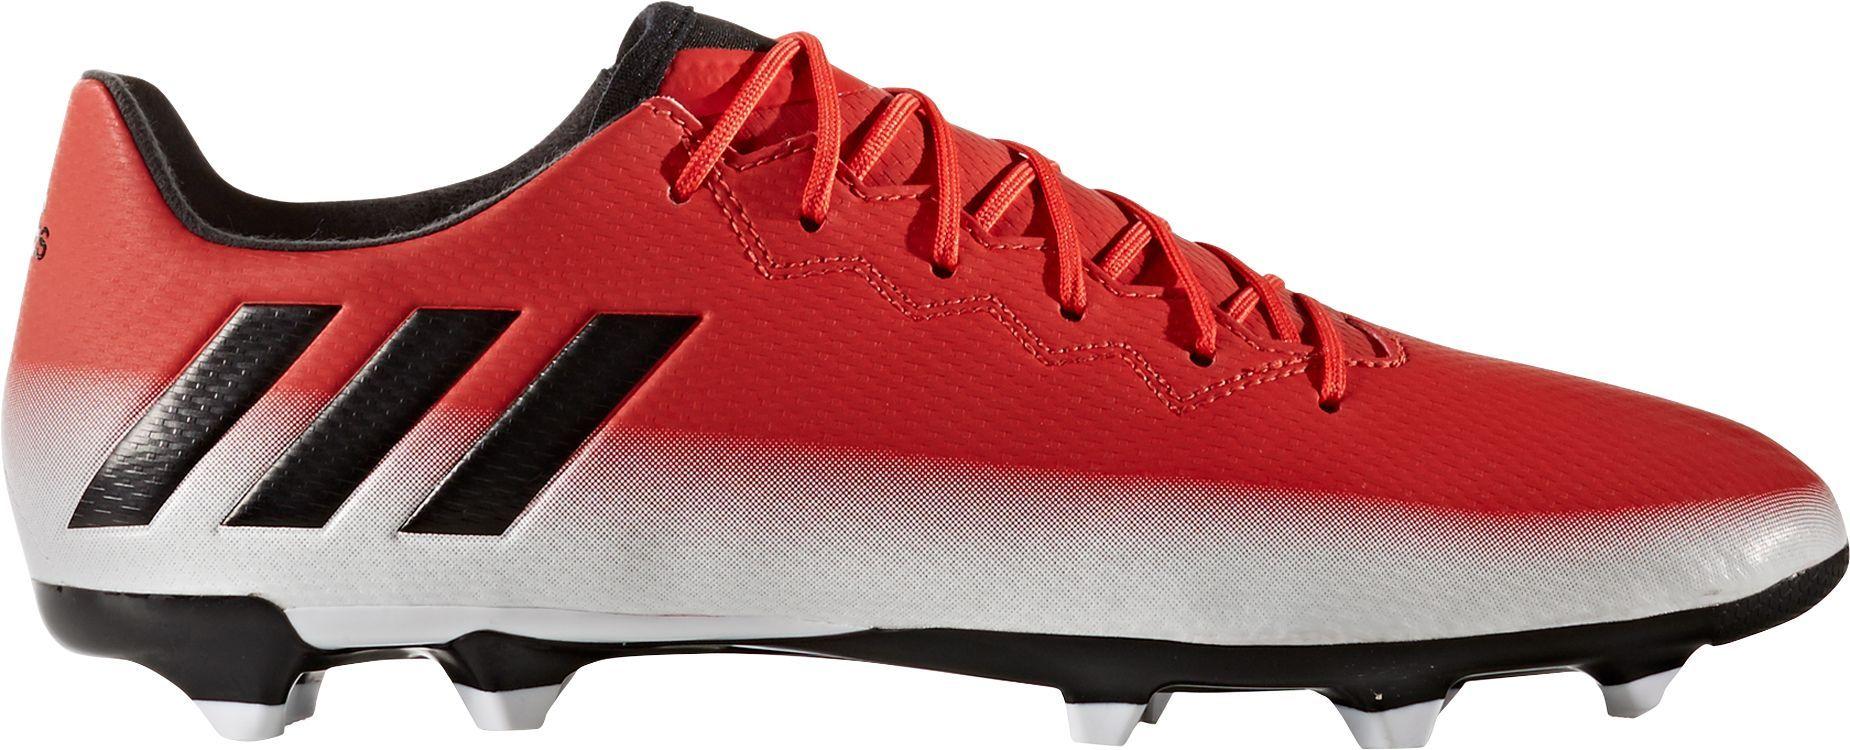 0201cdb23 adidas Men s Messi 16.3 FG Soccer Cleats